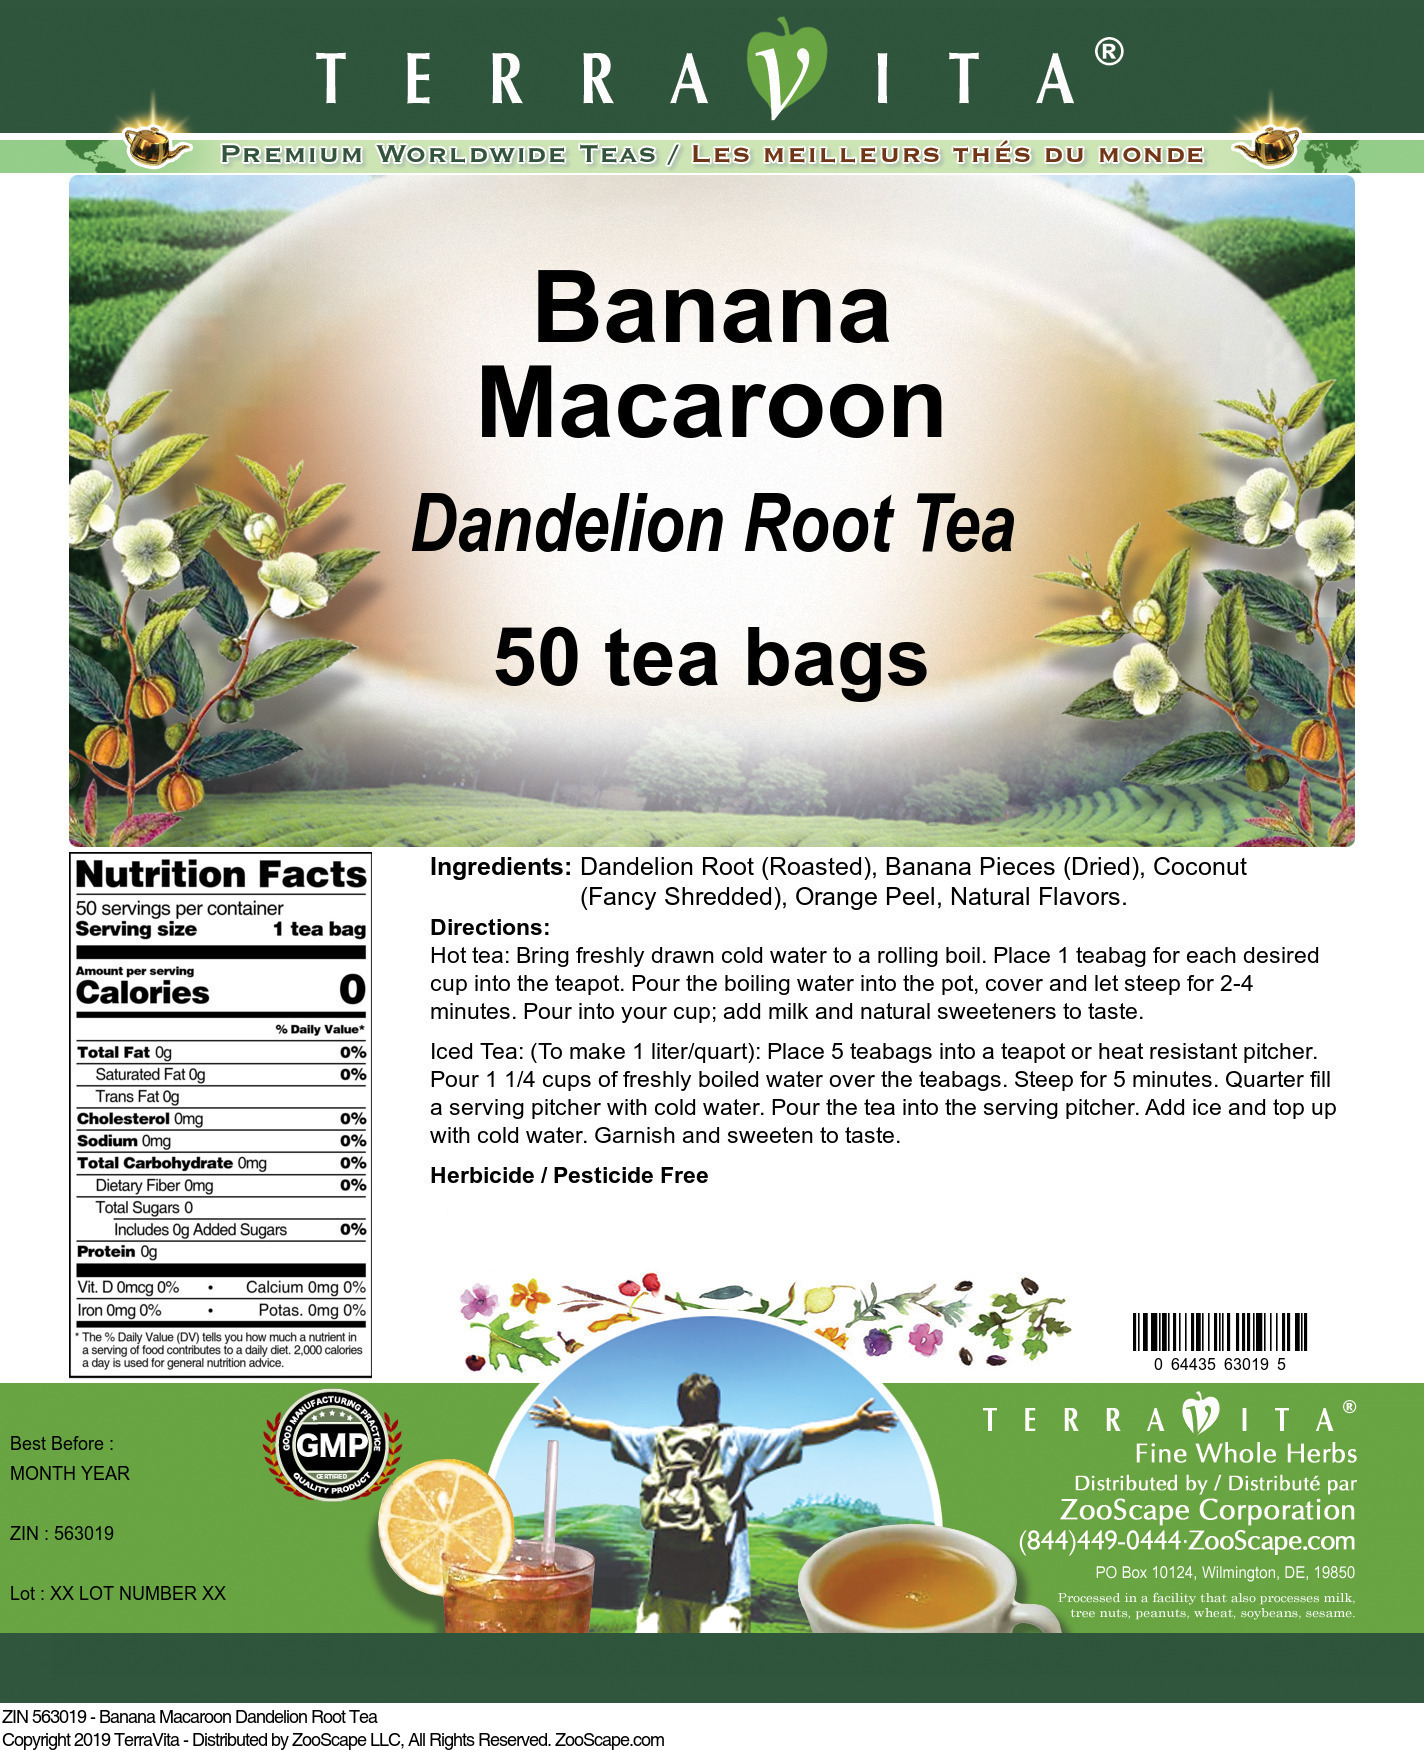 Banana Macaroon Dandelion Root Tea